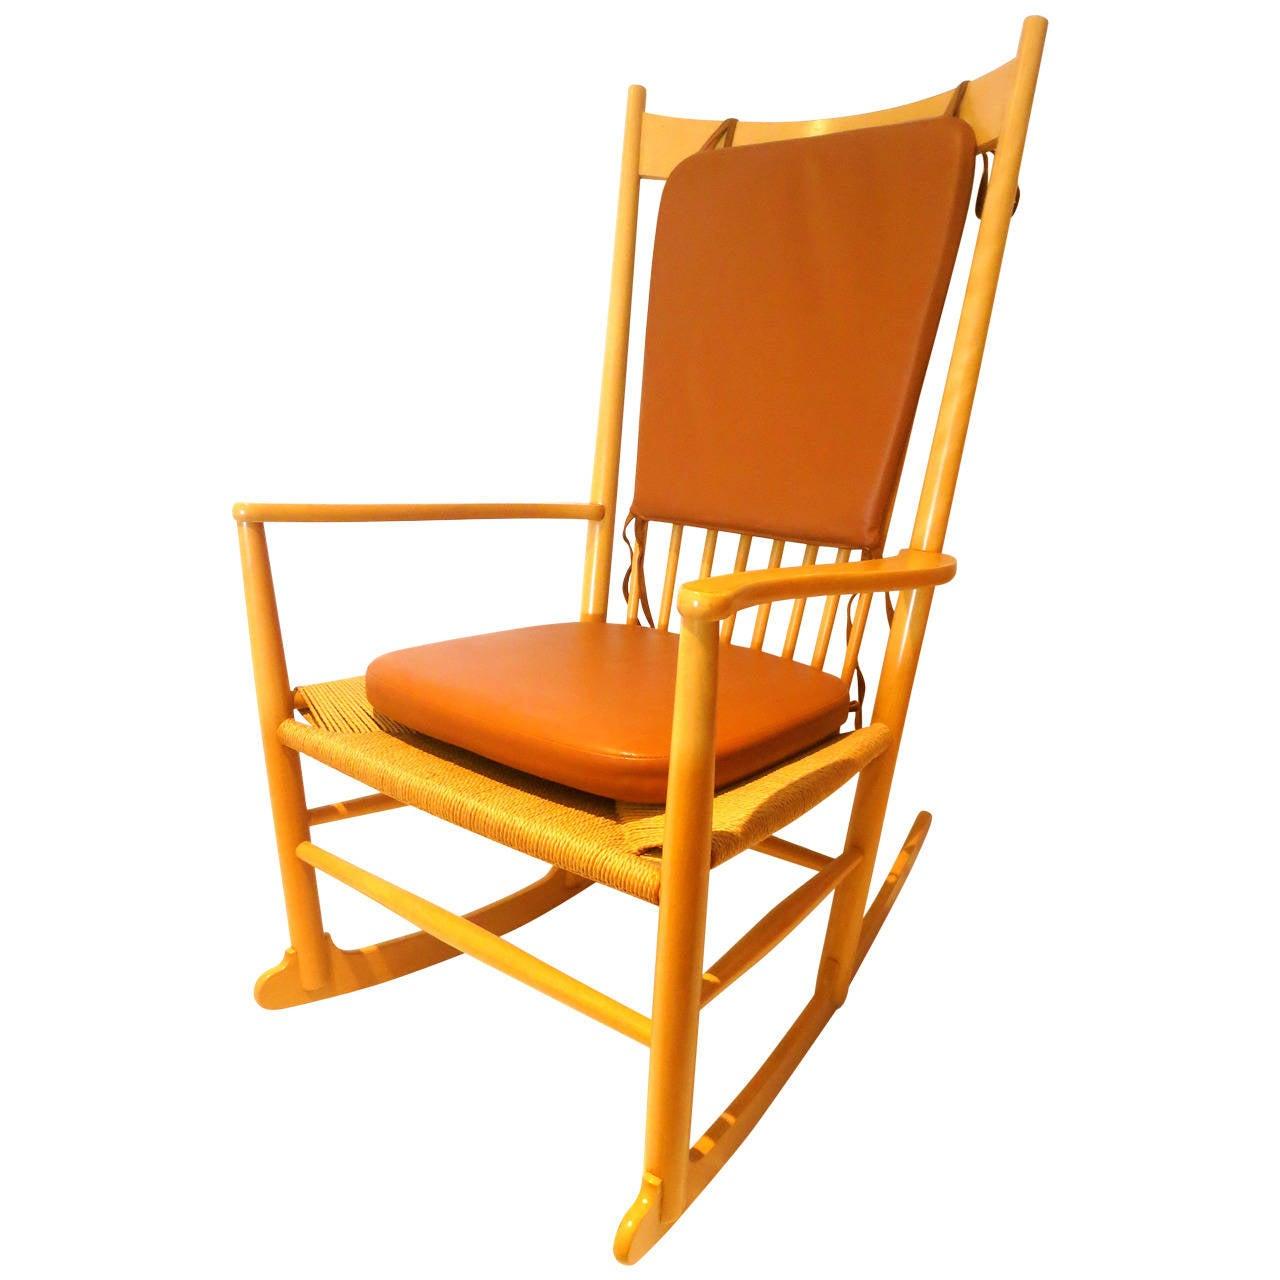 danish modern hans wegner rope seat and leather pads j16 rocker chair at 1stdibs. Black Bedroom Furniture Sets. Home Design Ideas